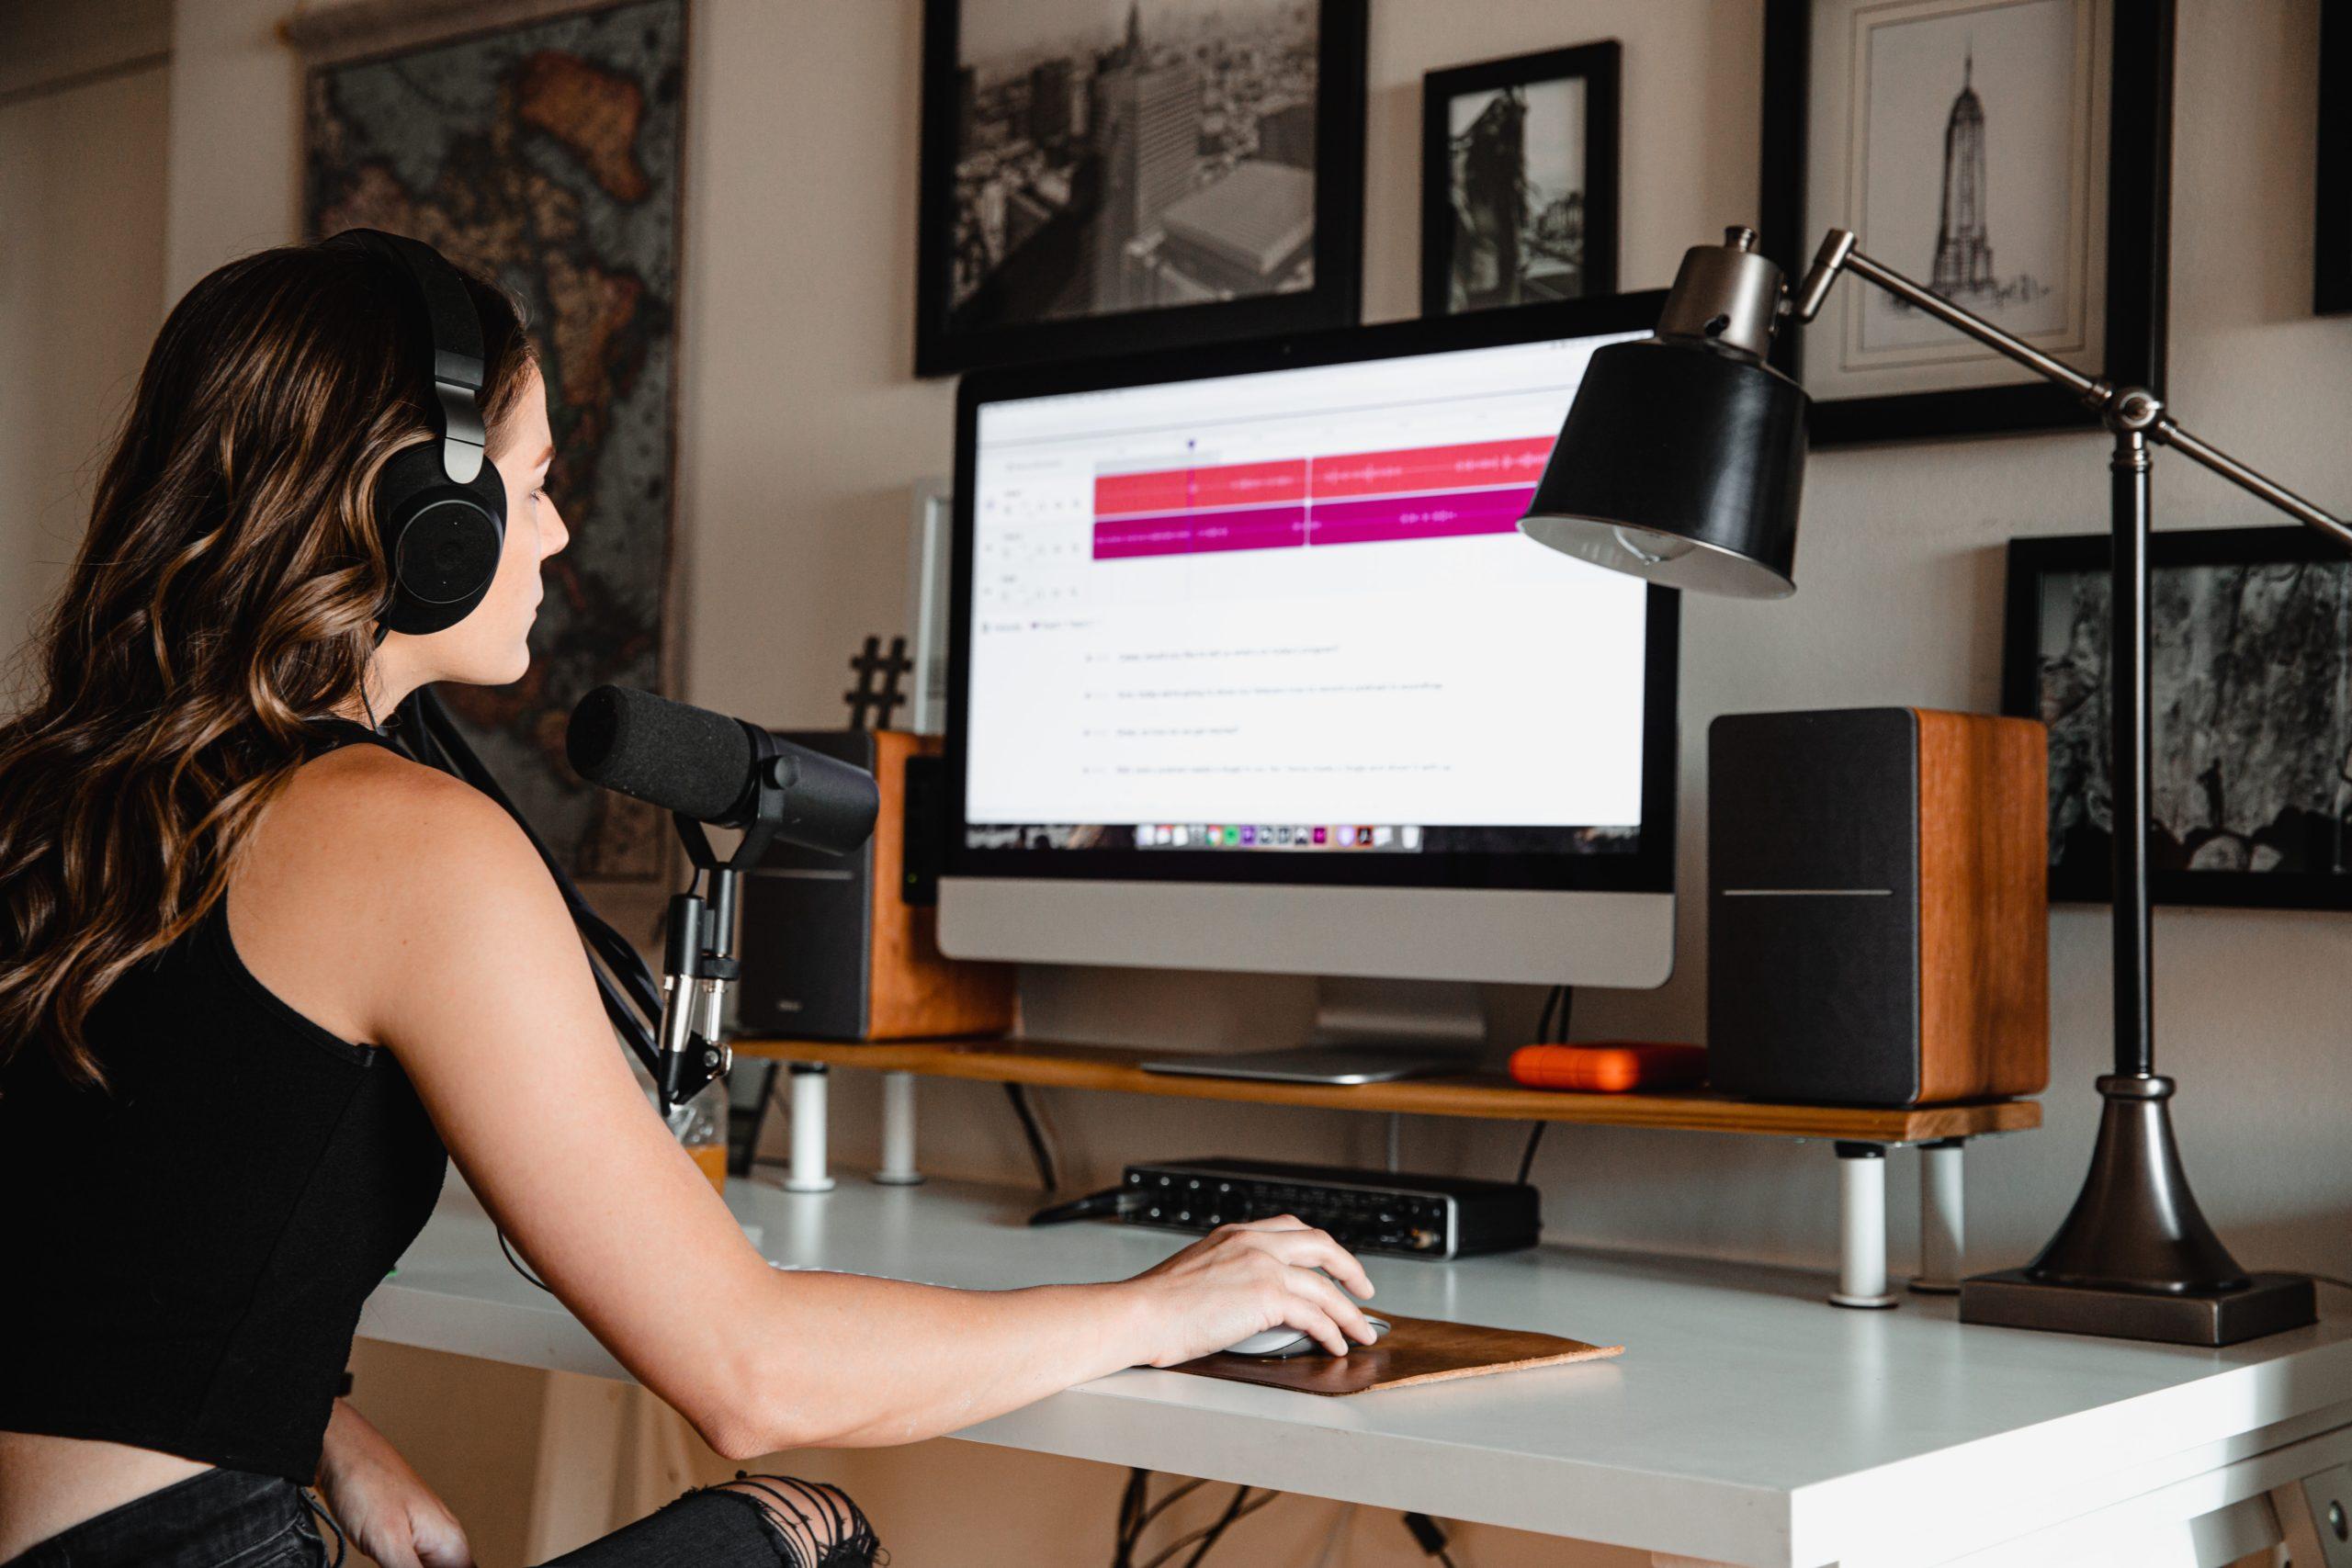 womans-home-studio-setup-scaled.jpg